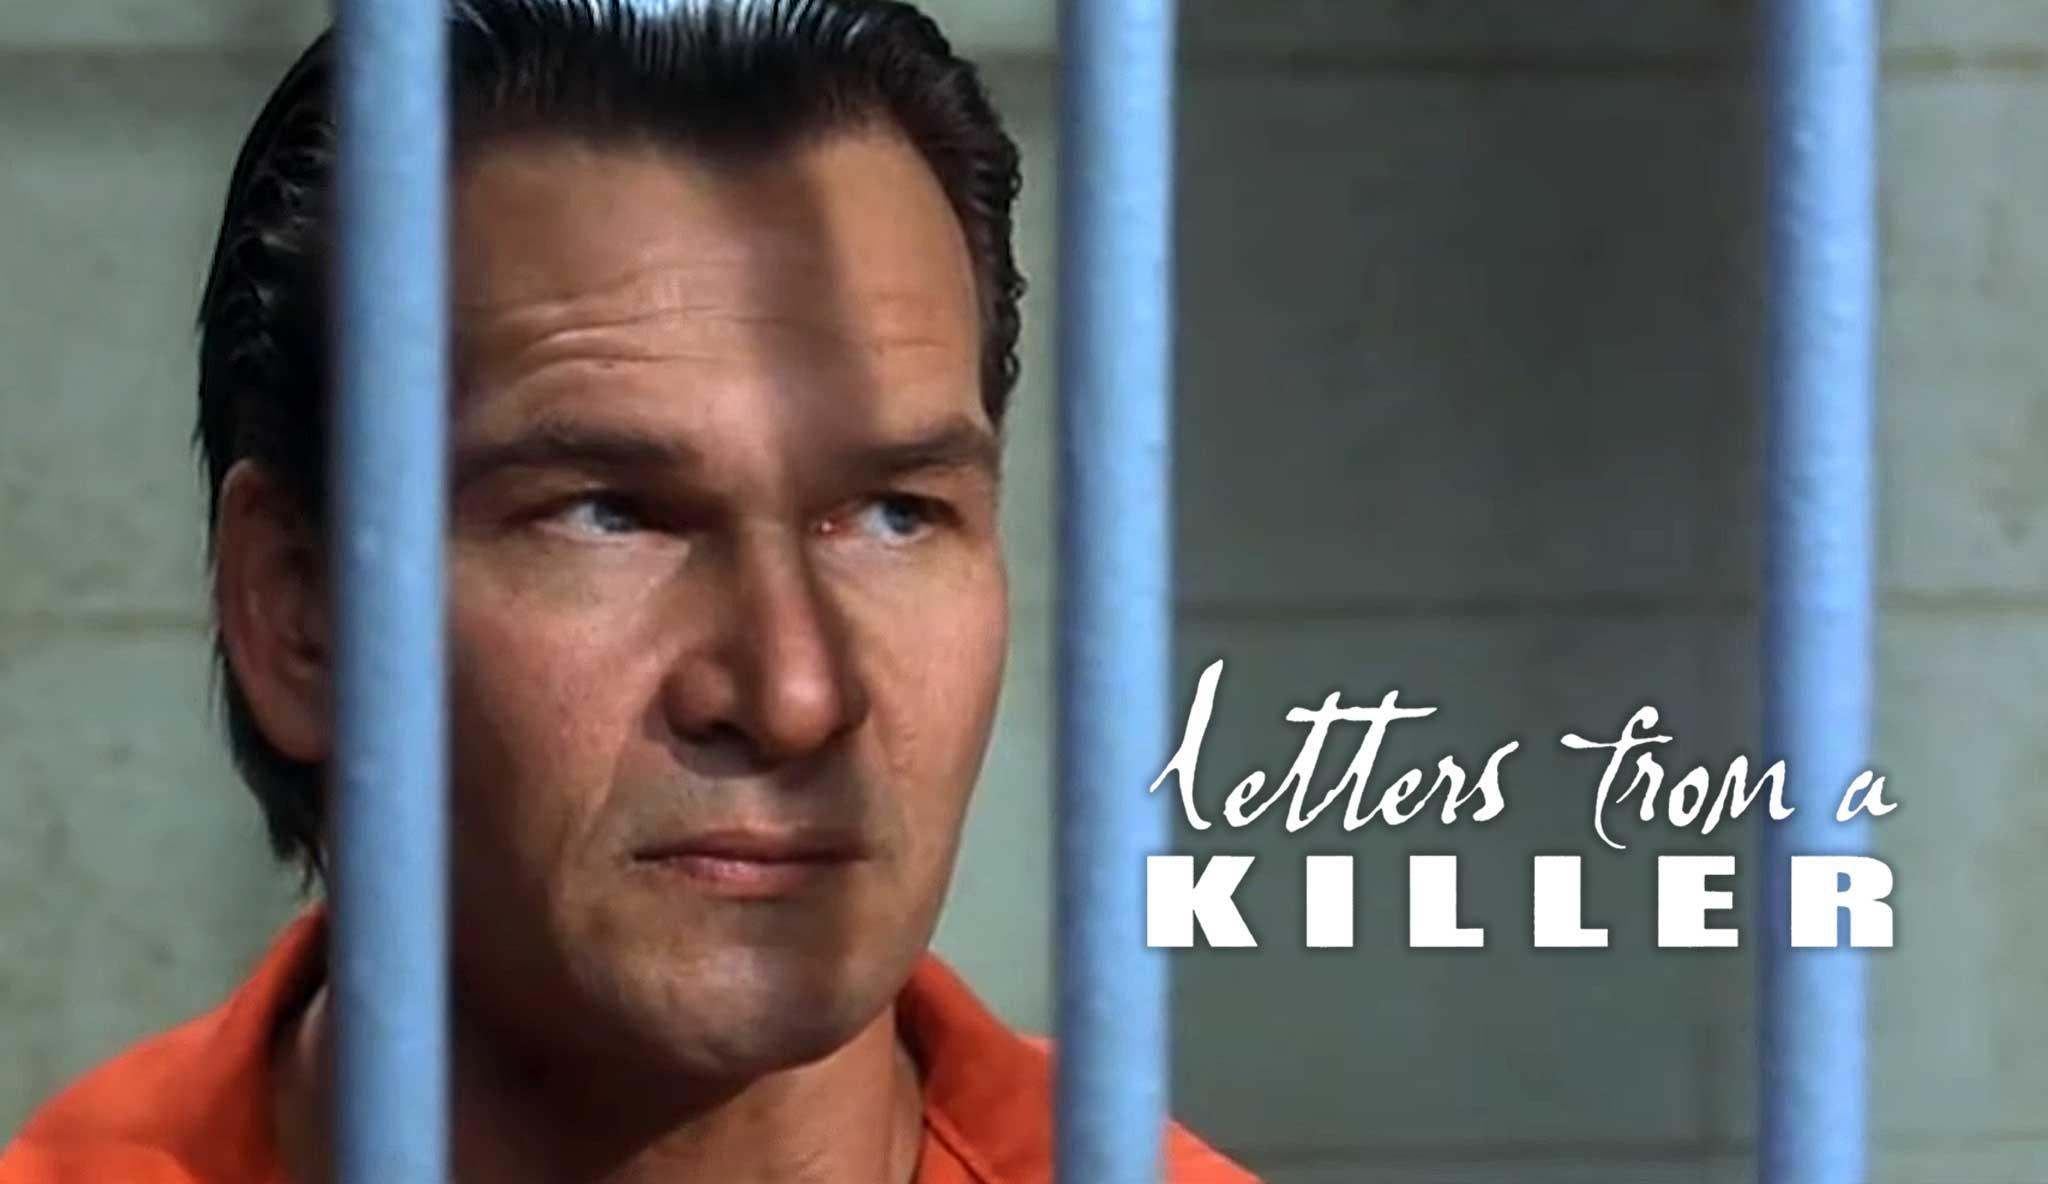 letters-from-a-killer\header.jpg